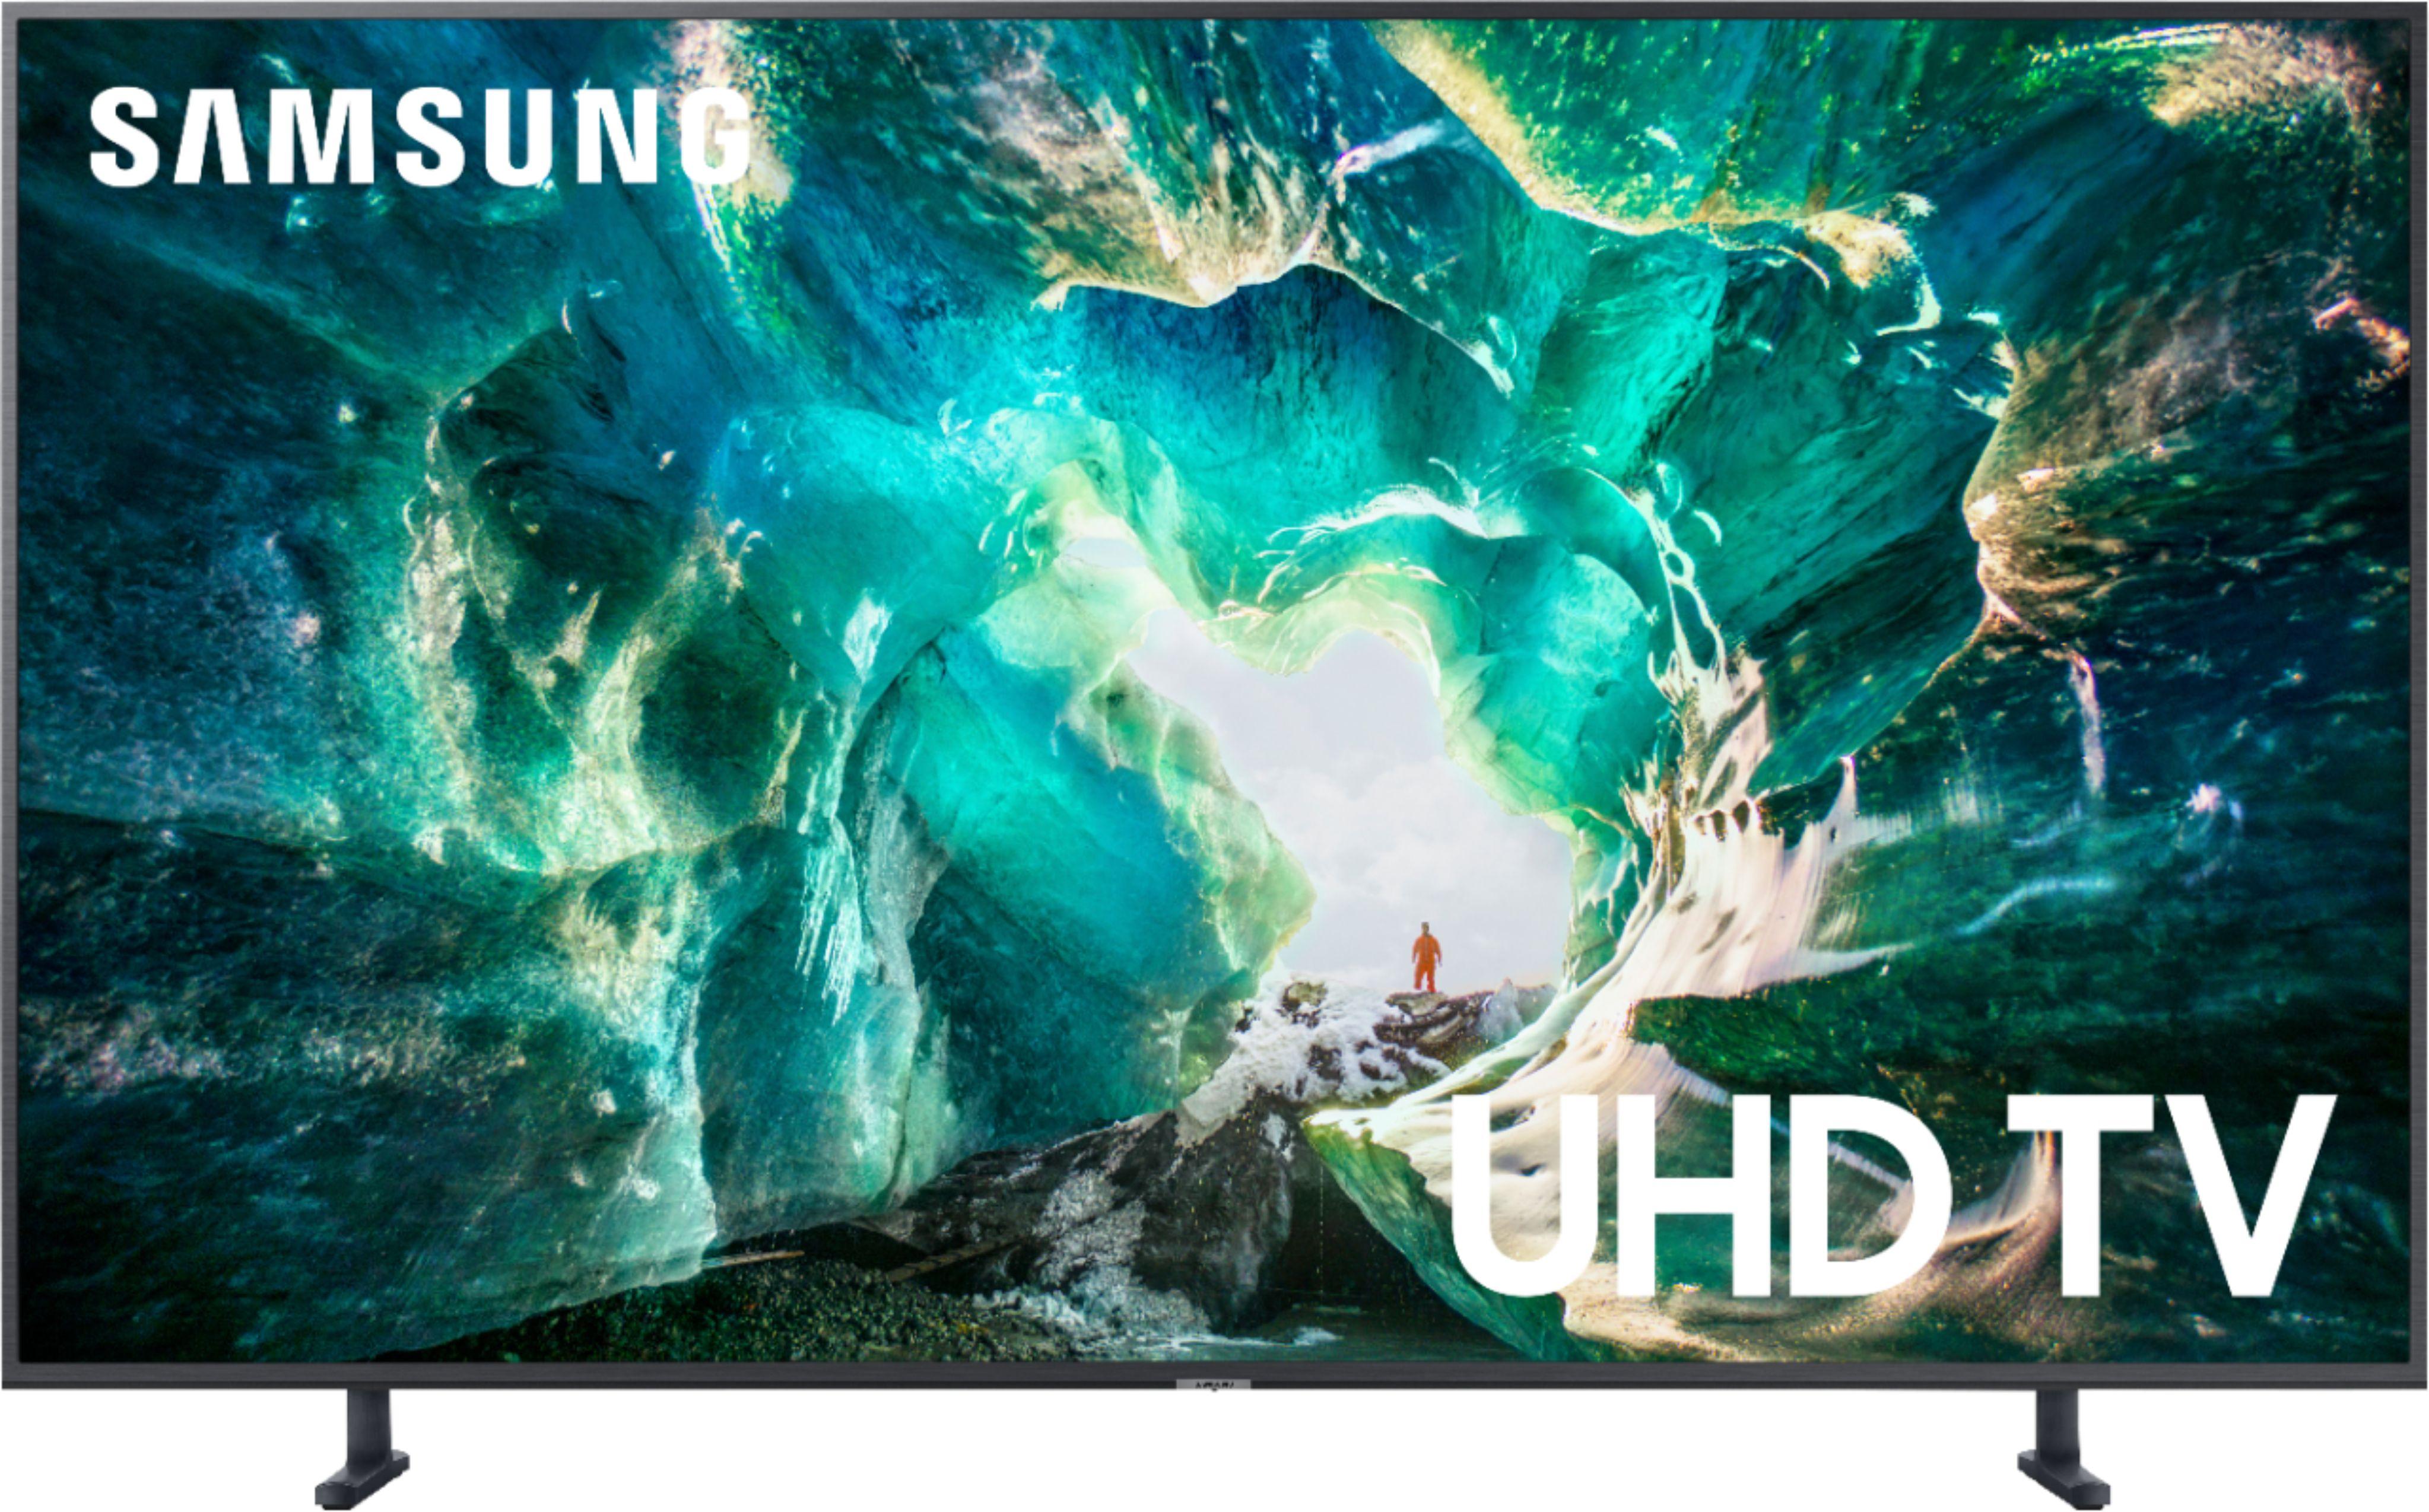 65 Samsung Un65ru8000 4k Uhd Smart Tv 2019 Model